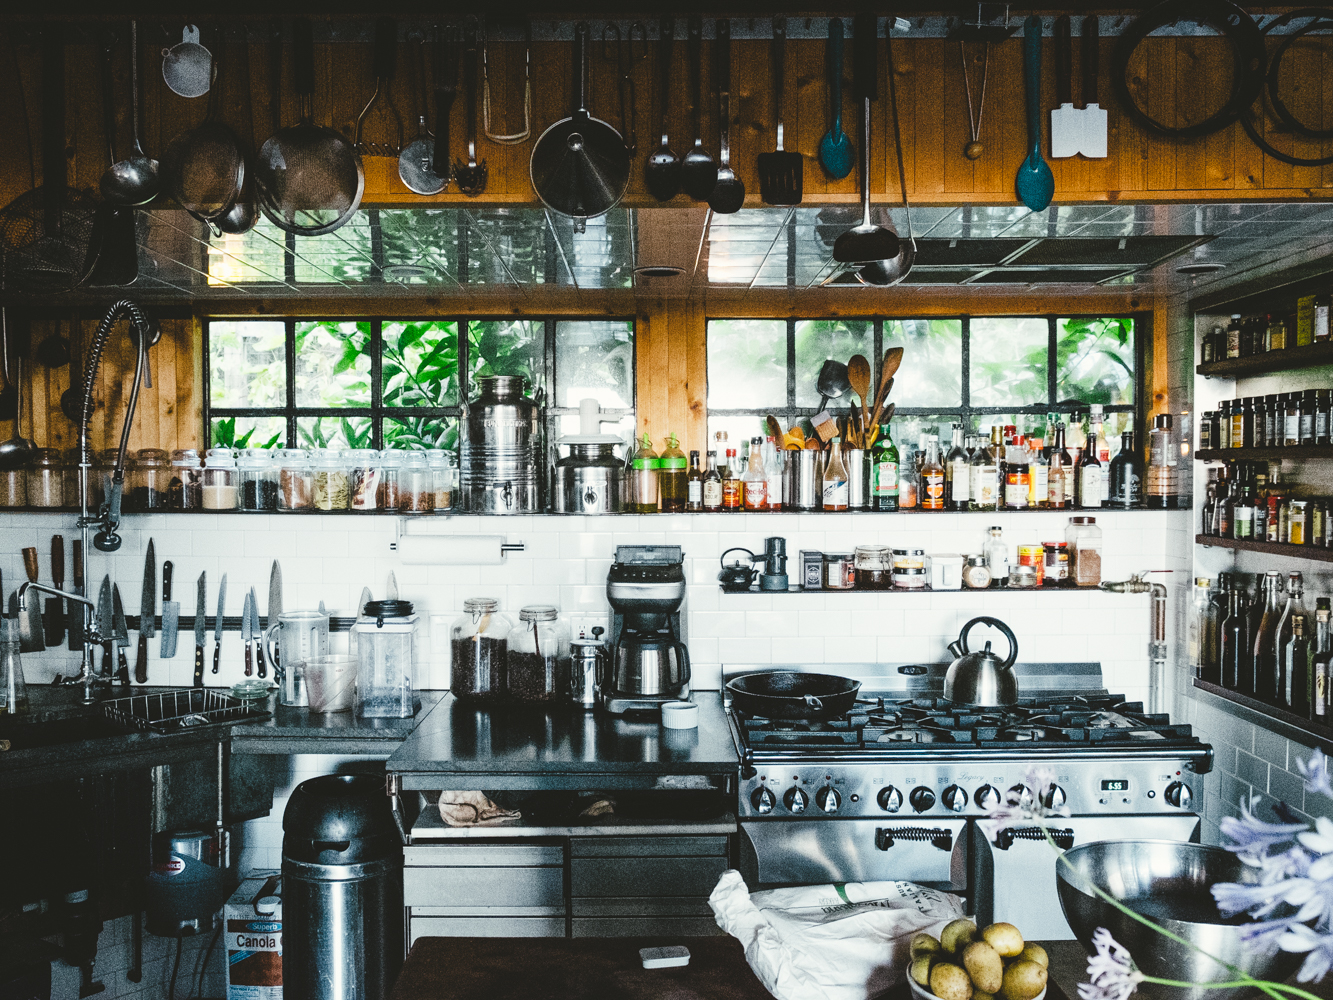 Kitchen-Cookwilltravel-Huckberry.jpg